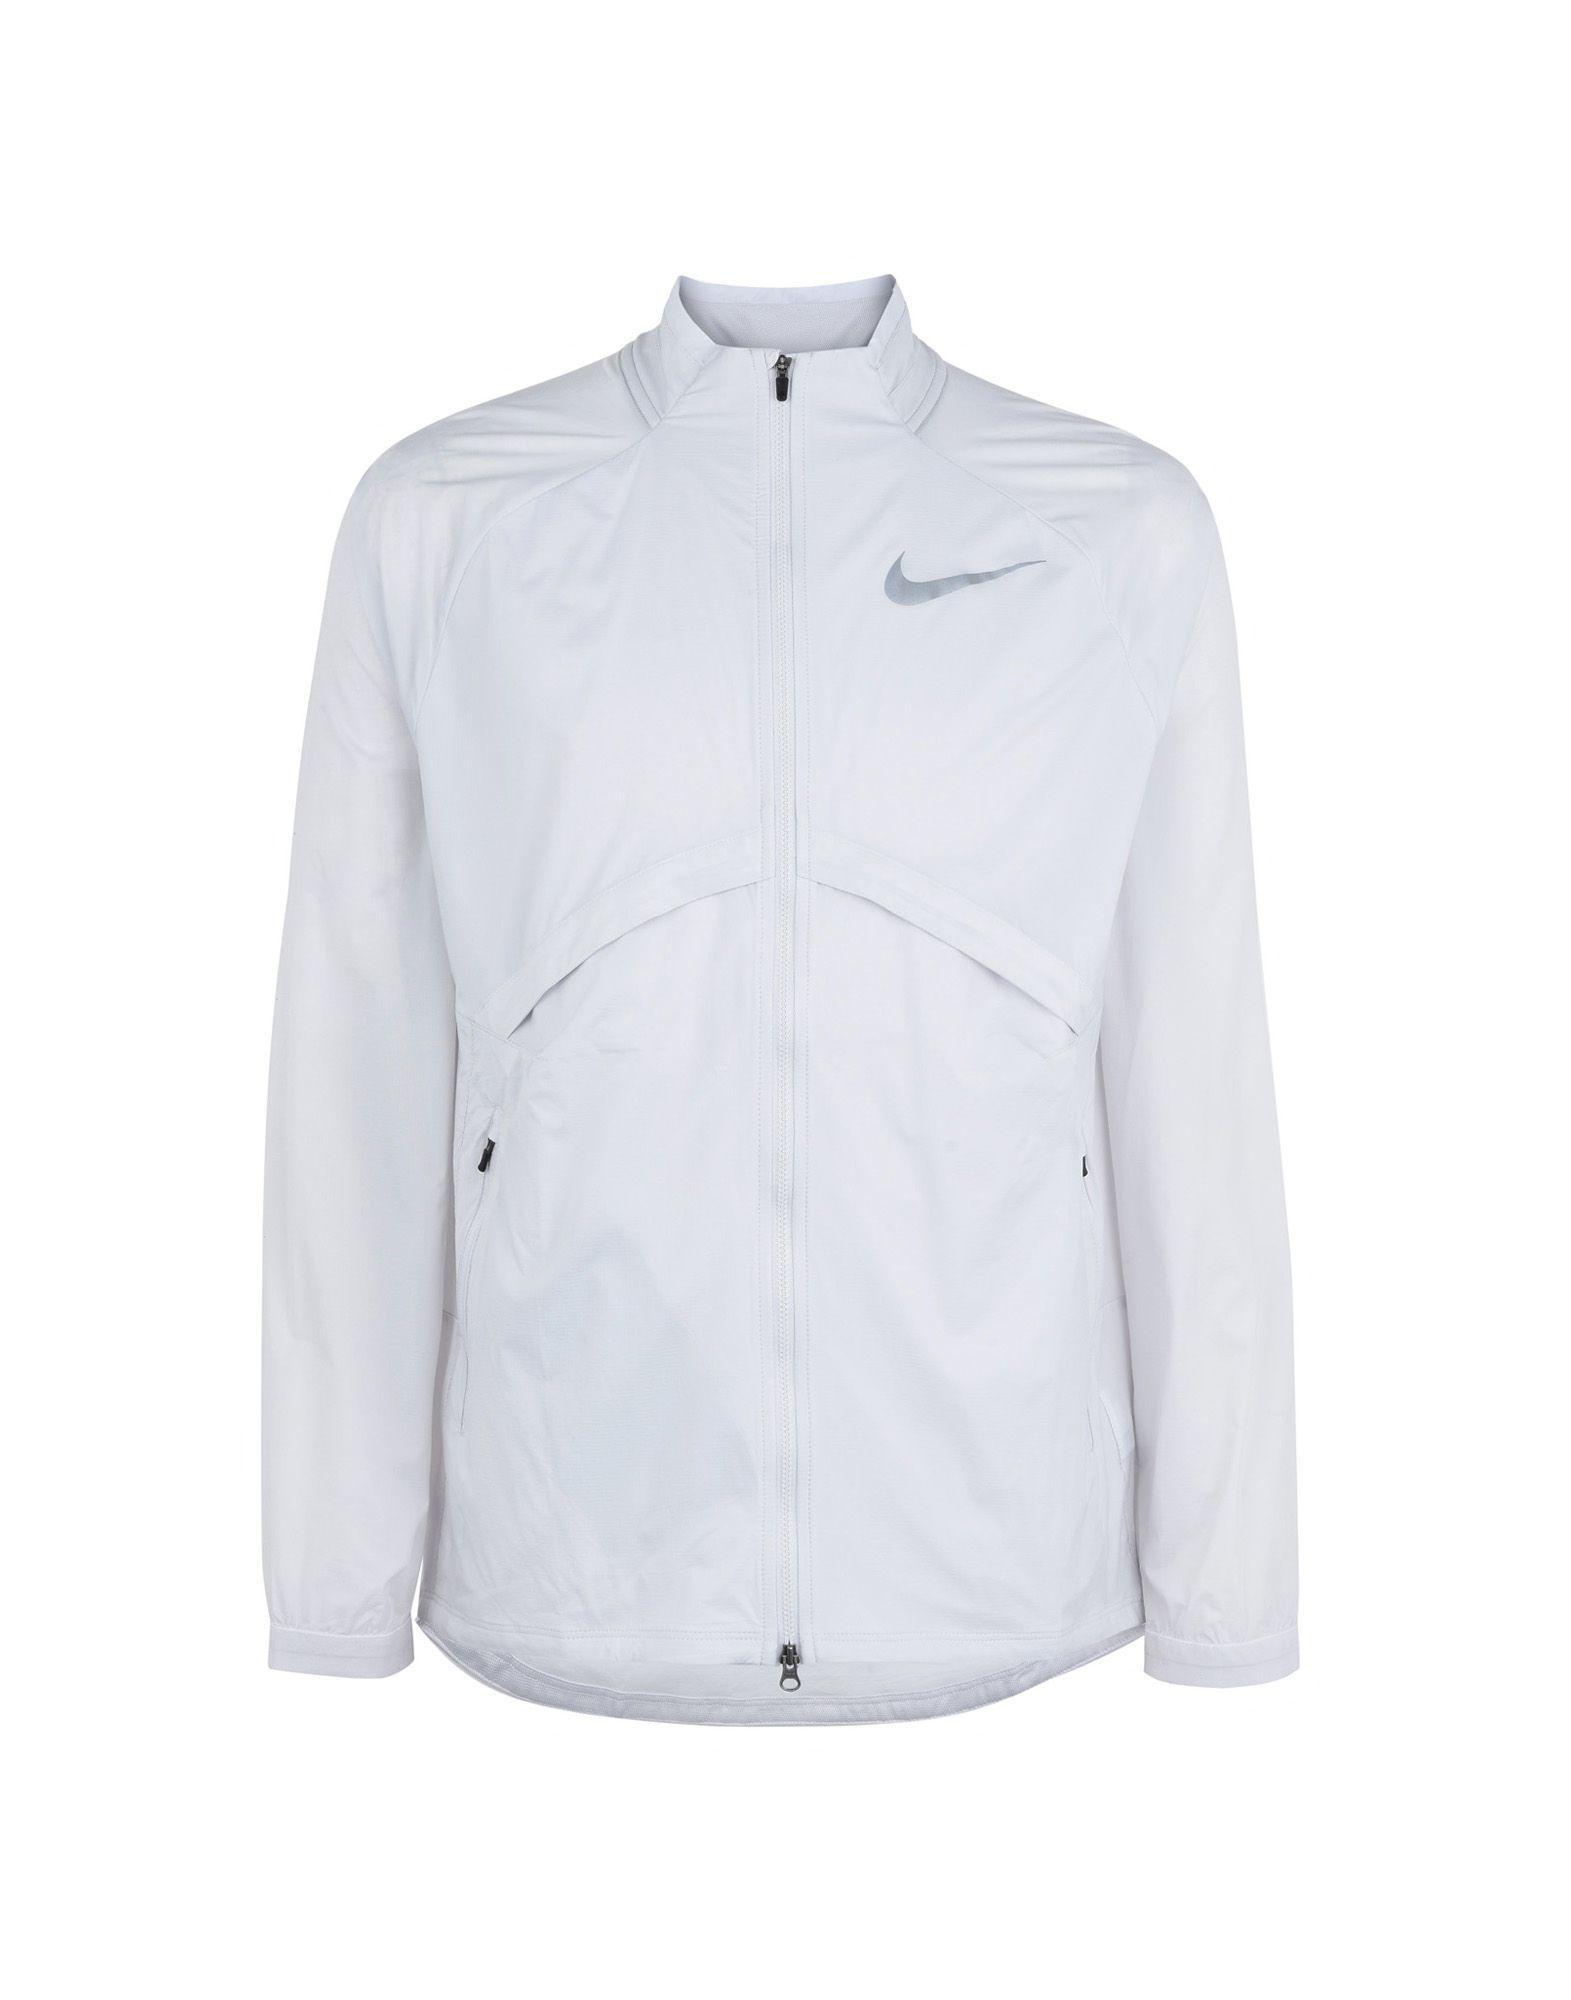 Giubbotto Nike  Shield Convertible Jacket - Uomo - Acquista online su